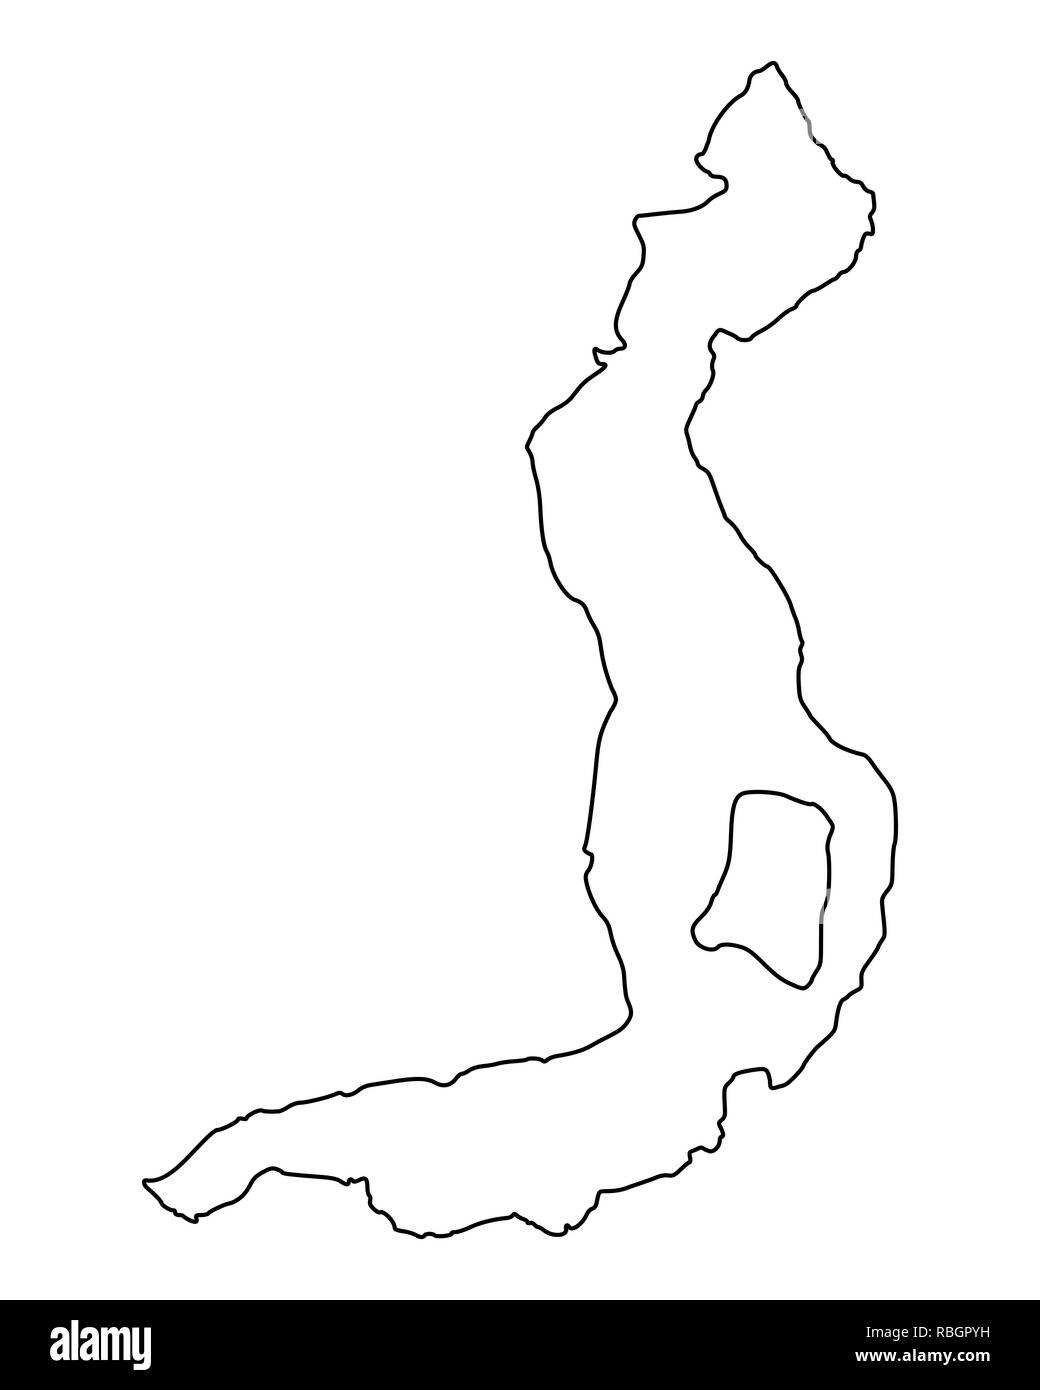 Map of Lake Iseo - Stock Image